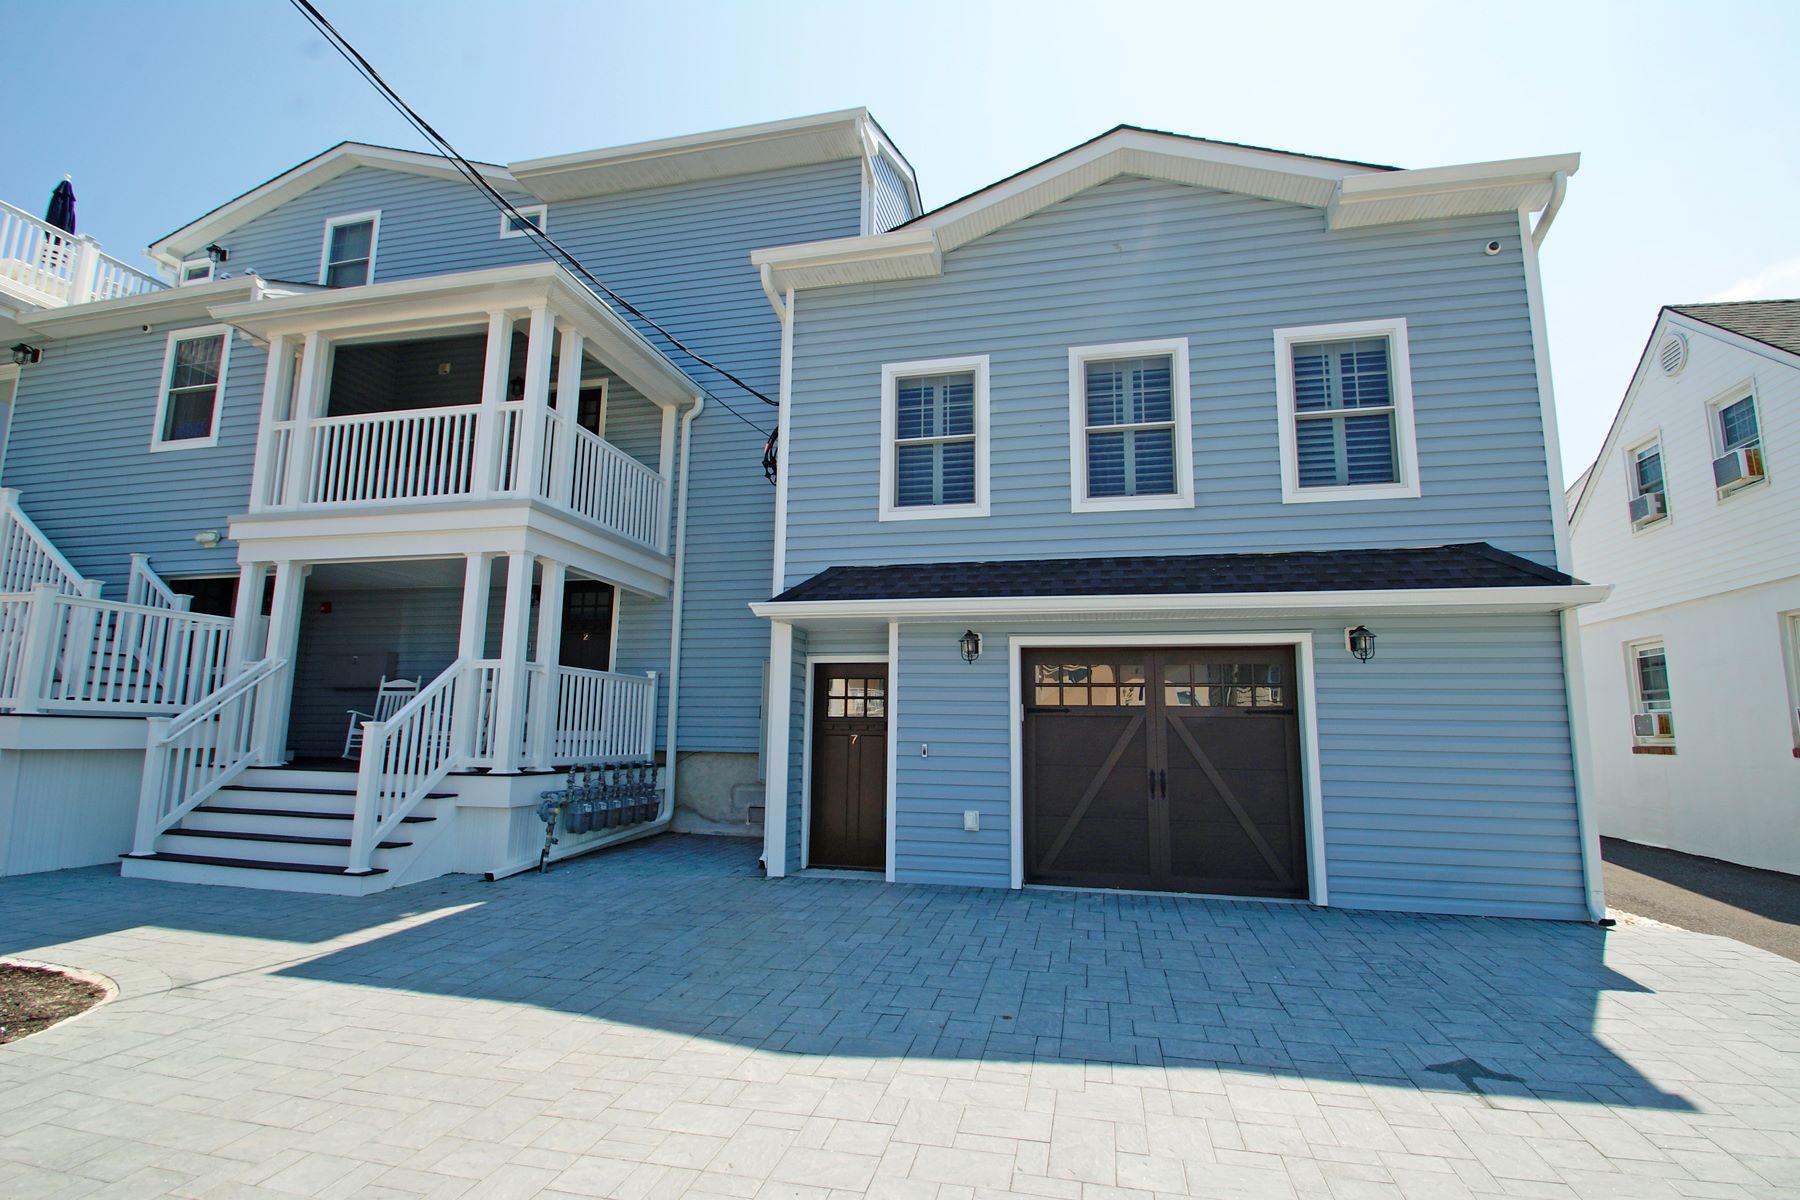 Condominiums для того Продажа на Beautifully Renovated Condo Just Steps To The Beach 1301 Ocean Avenue Unit #2, Point Pleasant Beach, Нью-Джерси 08742 Соединенные Штаты